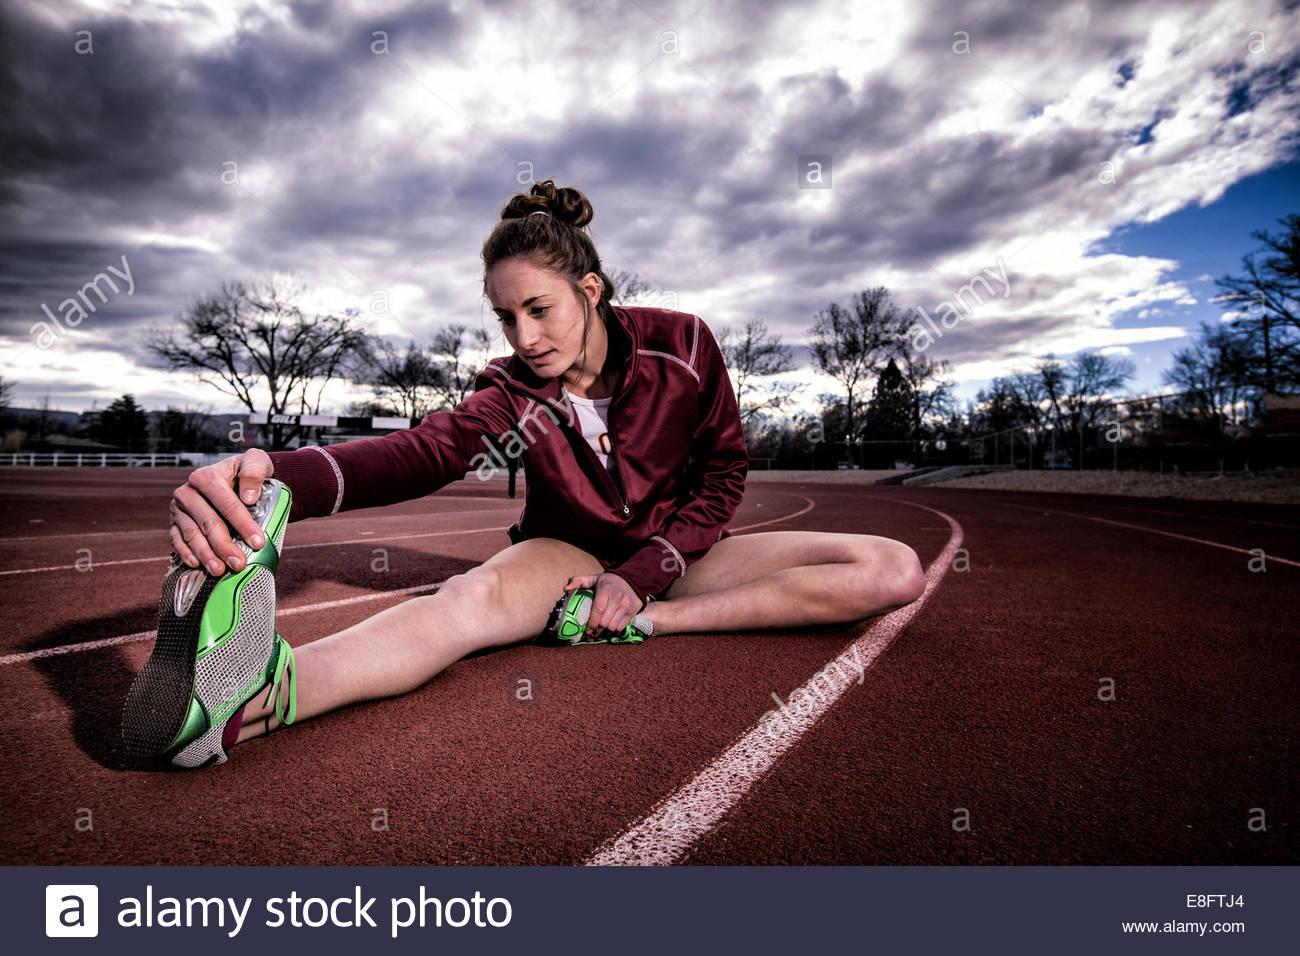 Female runner sitting on running track stretching, Colorado, America, USA - Stock Image